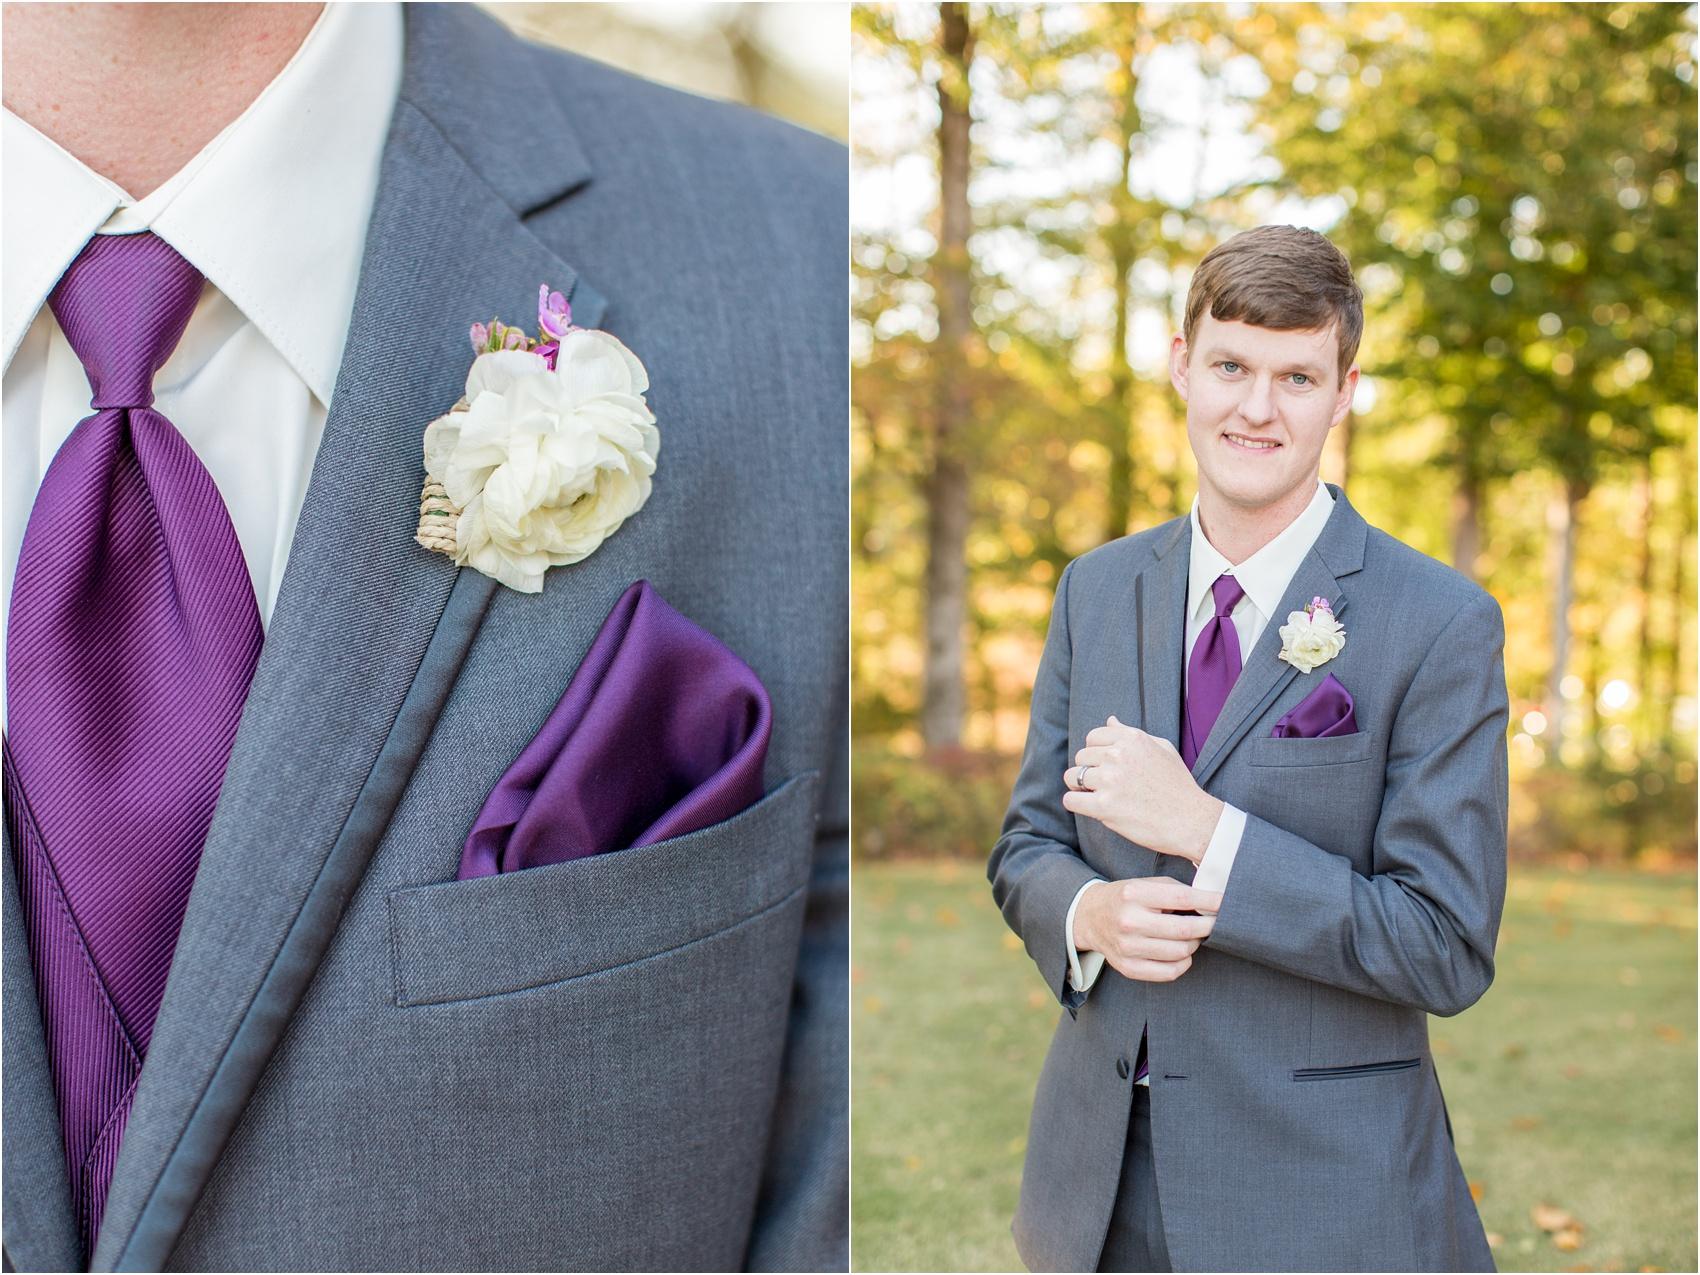 Savannah Eve Photography- Perkins Wedding- Blog-26.jpg